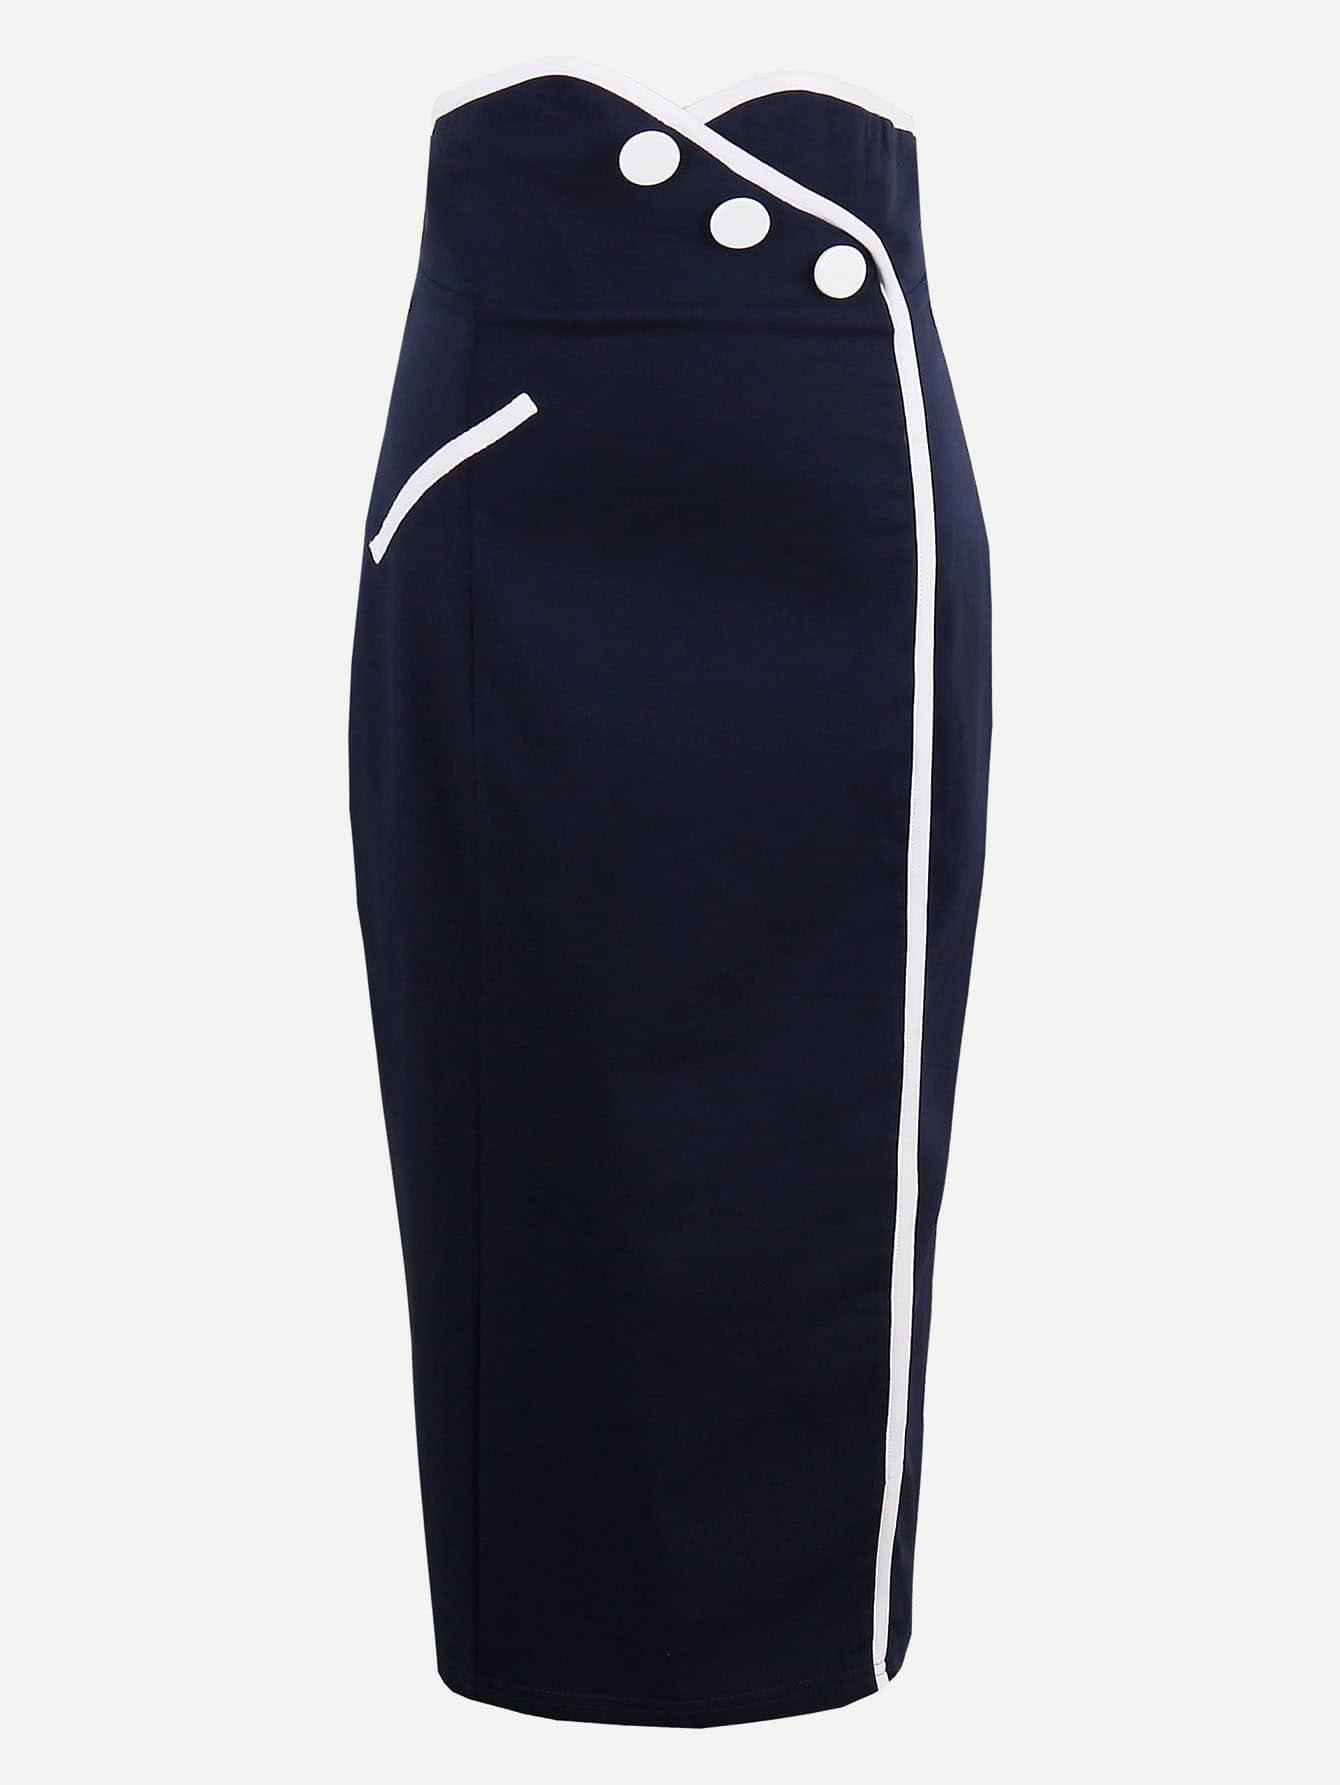 Contrast Trim Zipper Back Sheath Skirt